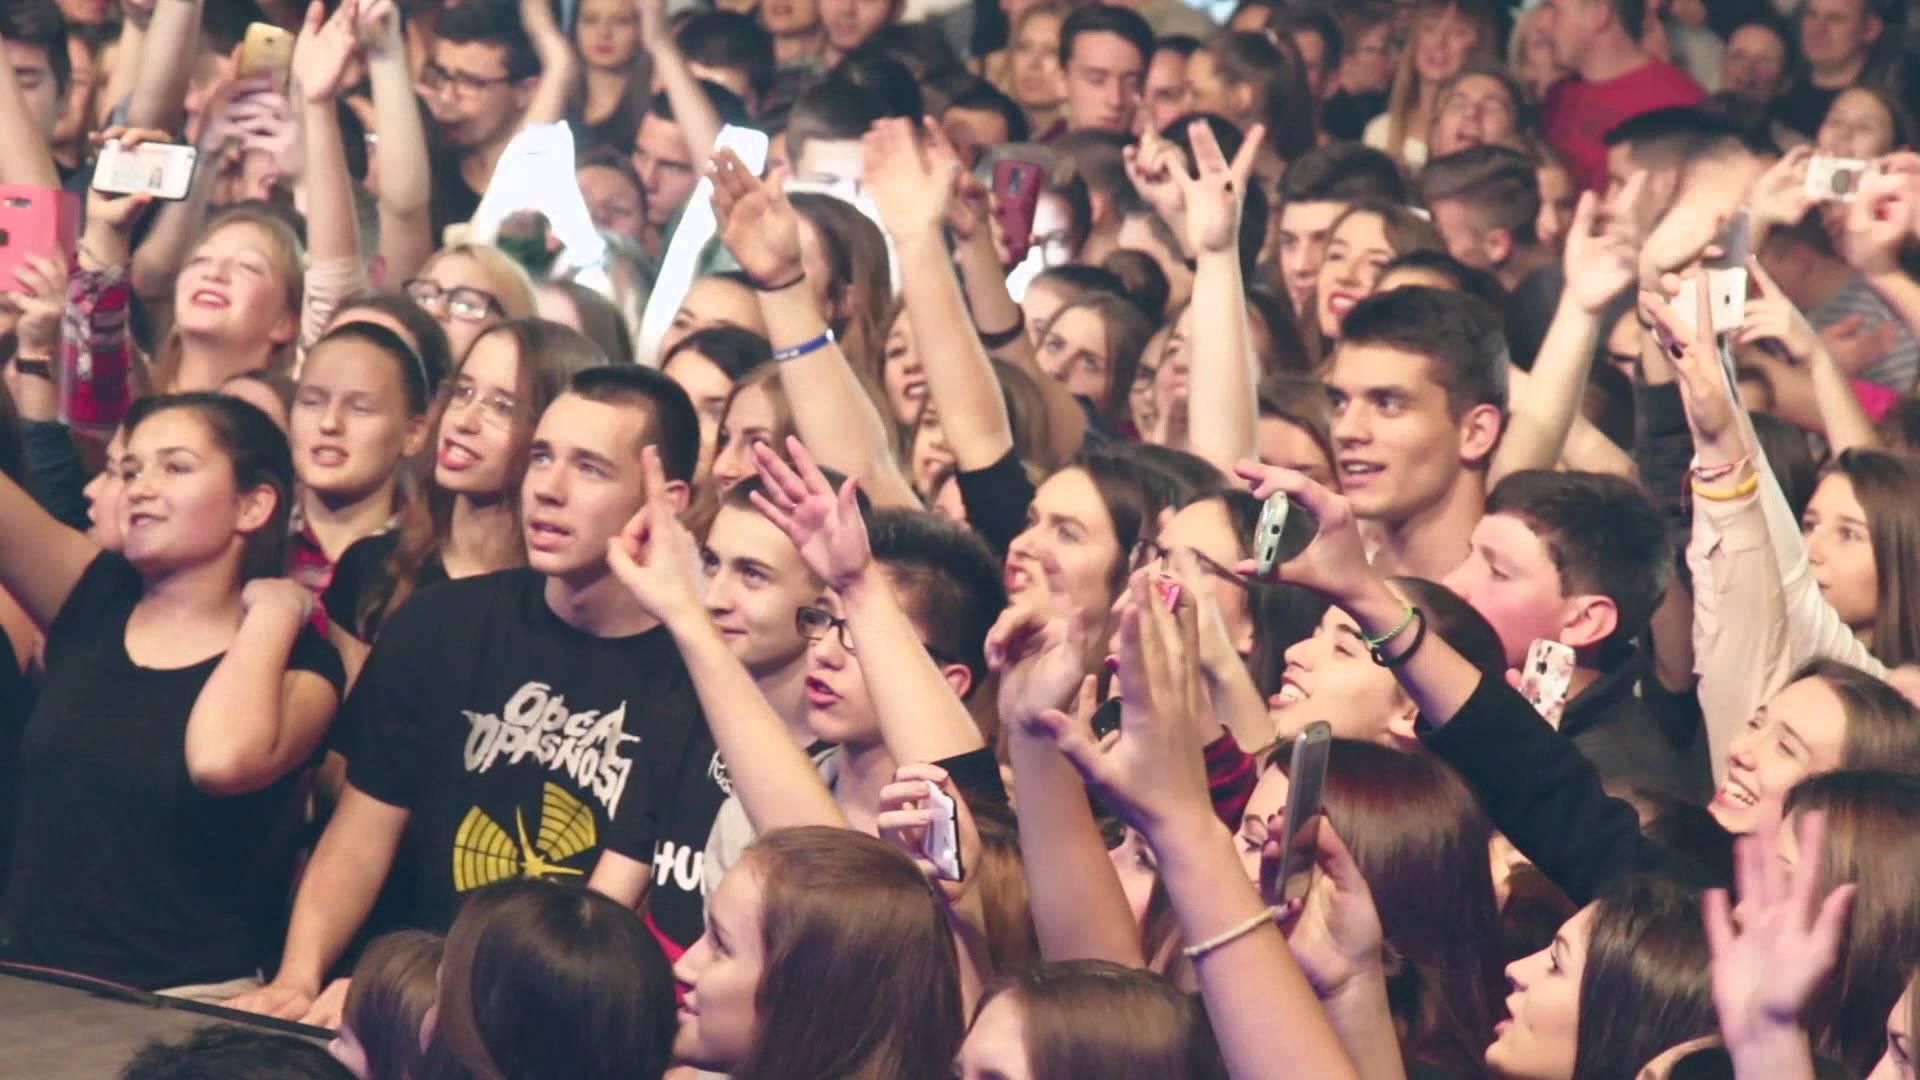 Pravila Igre live @ Županja - highlights